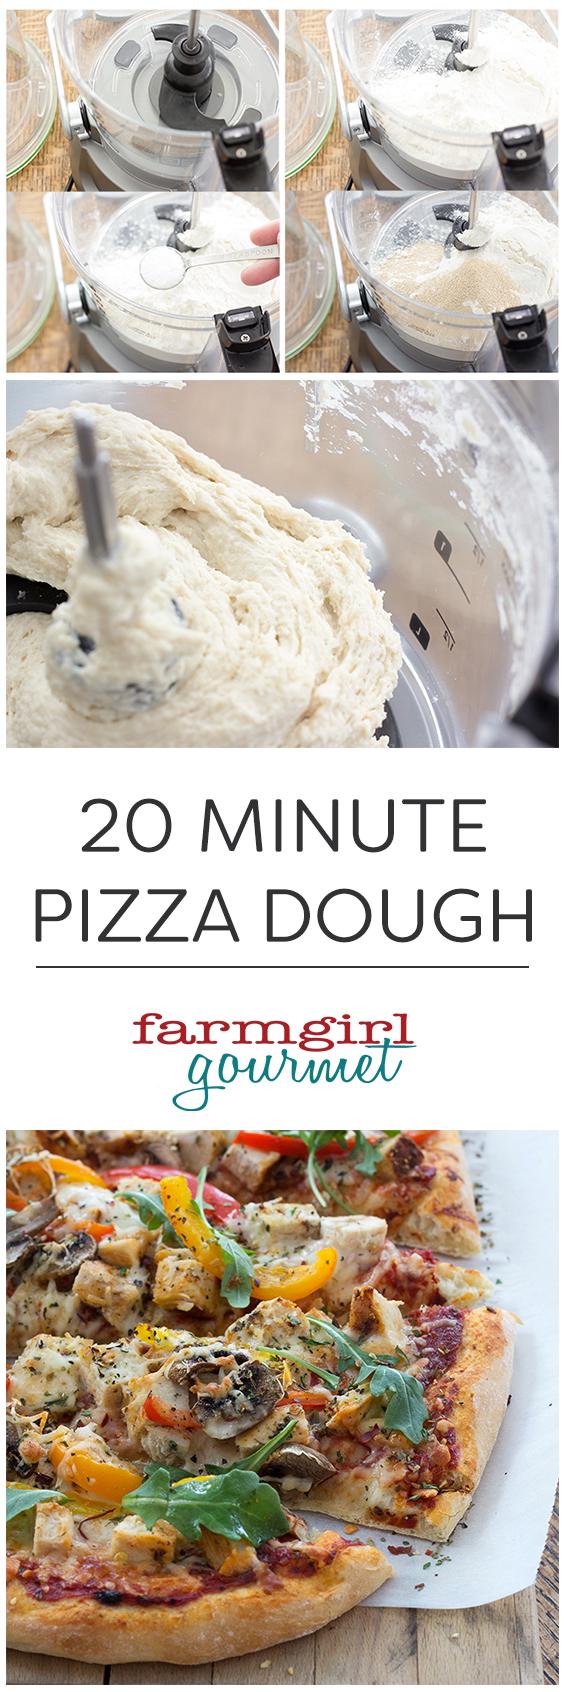 Easy 20 Minutes Pizza Dough Recipe | farmgirlgourmet.com